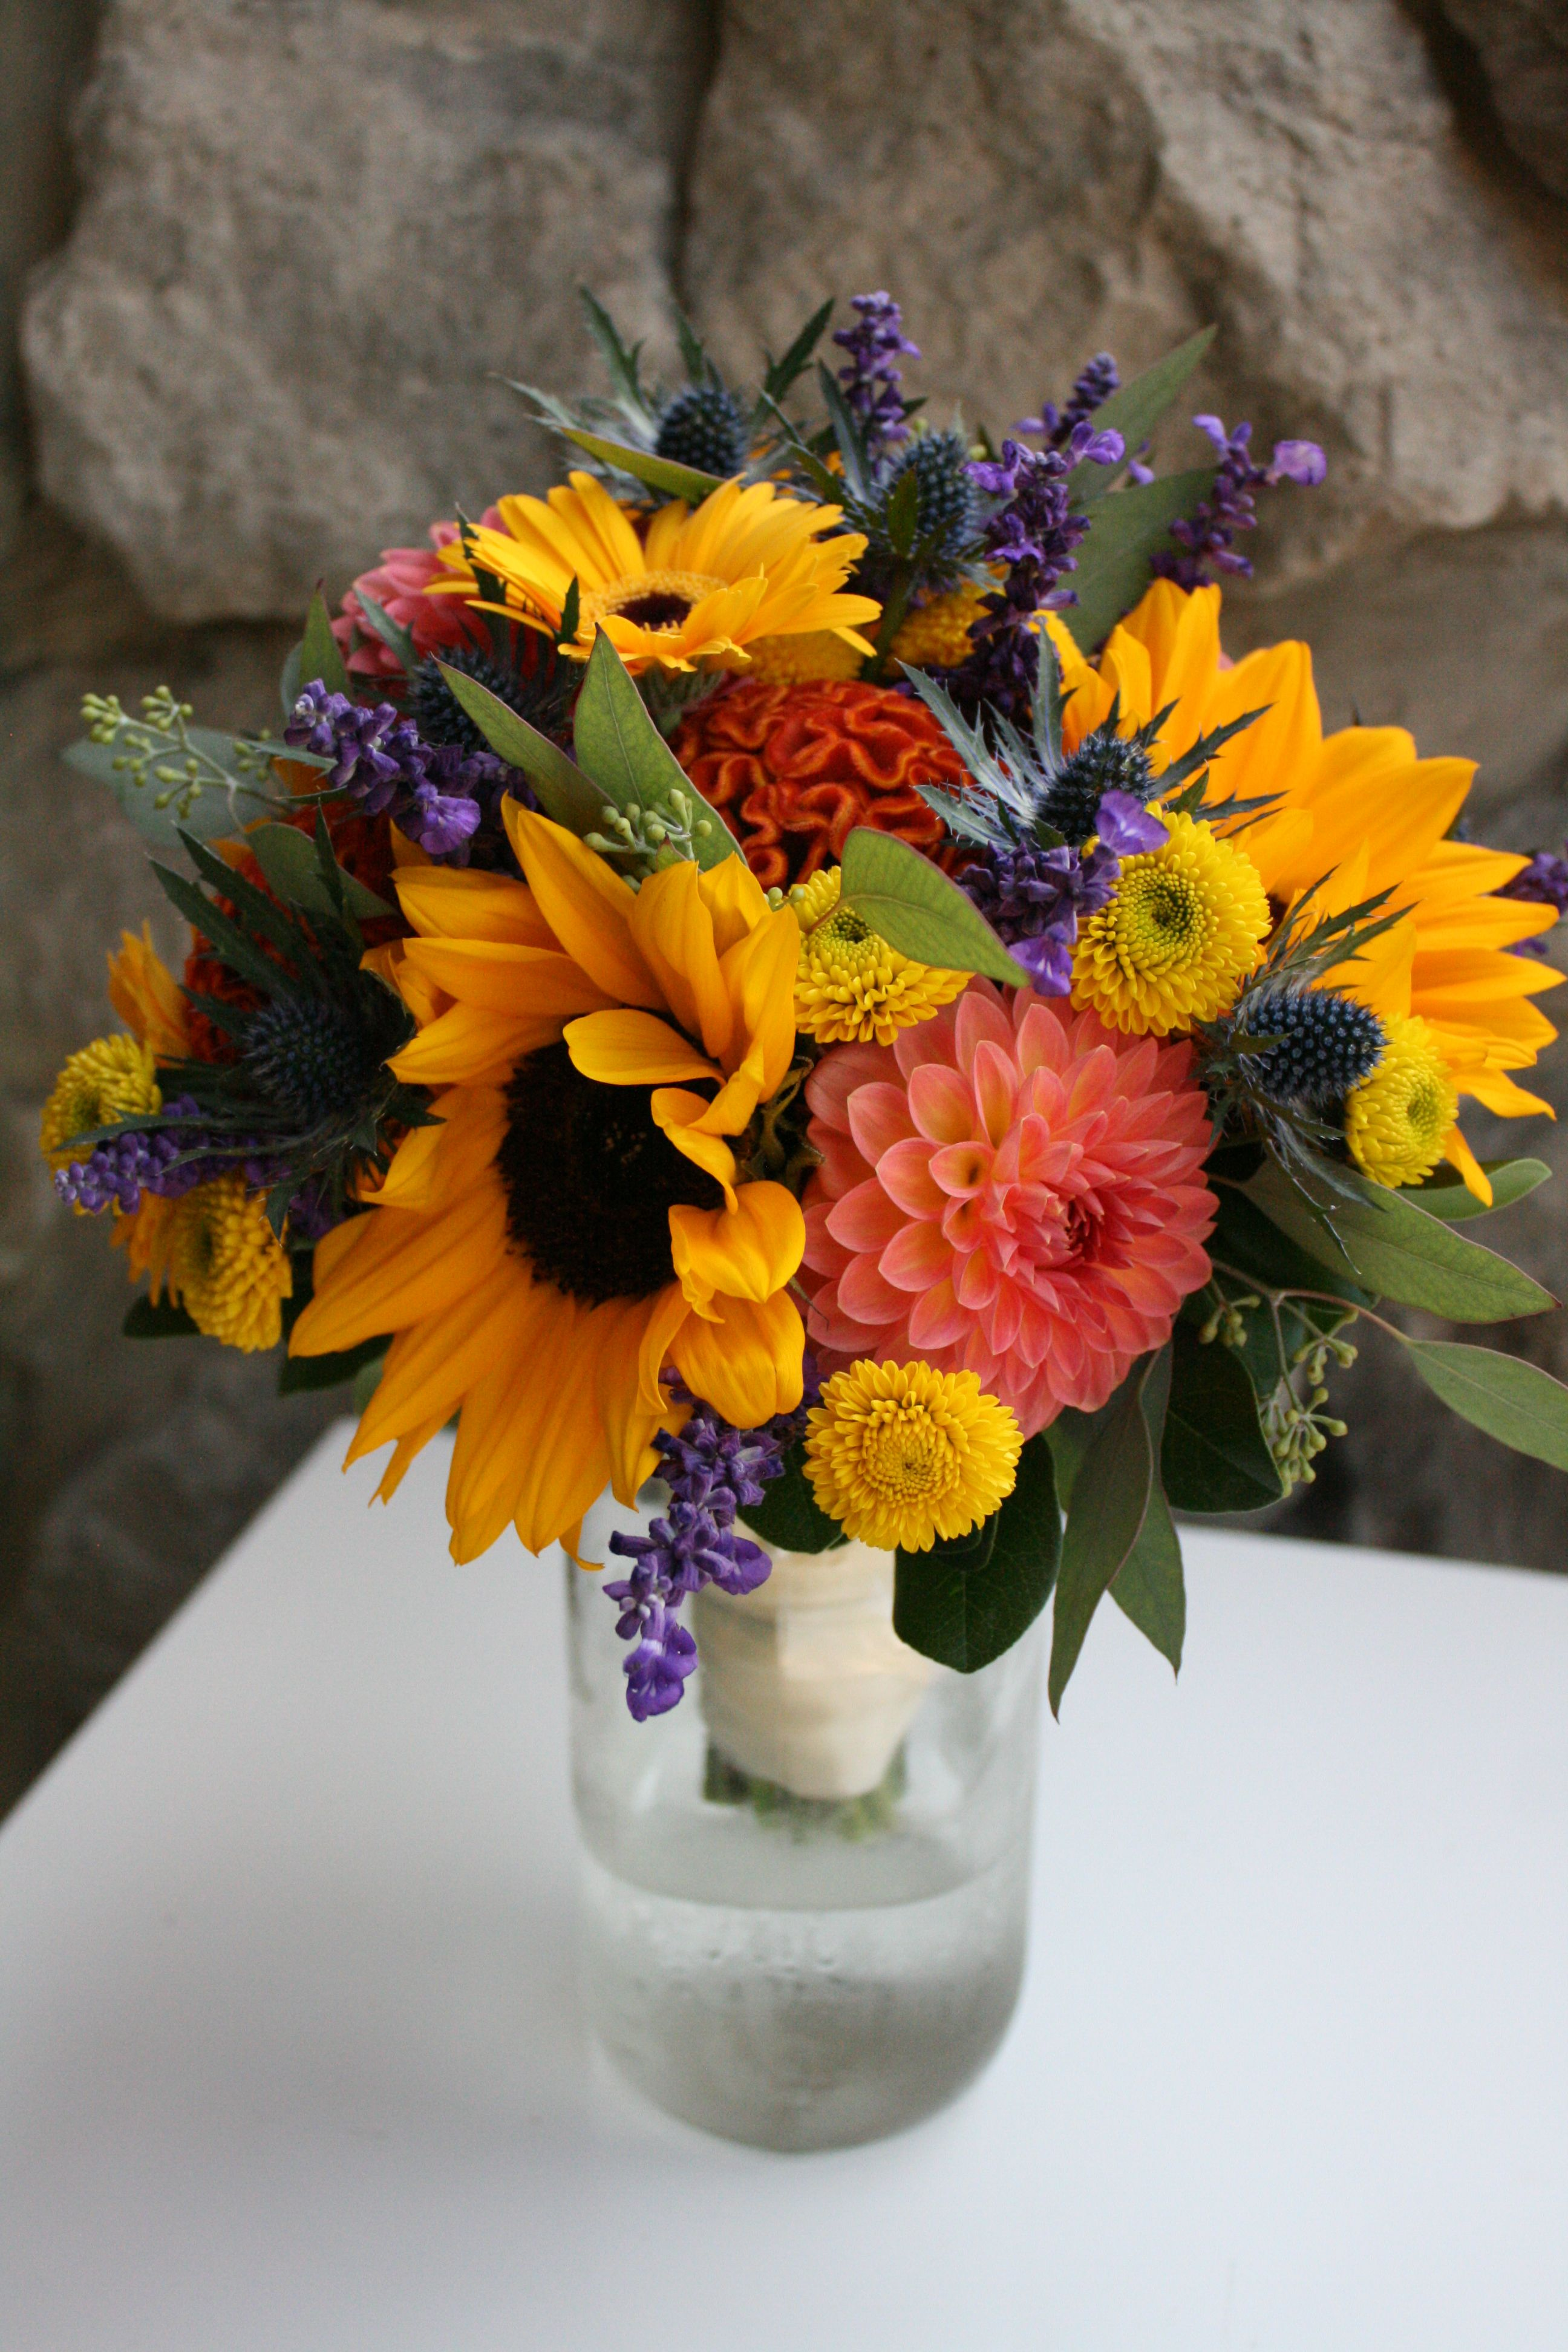 Summer bouquet of dahlia, sunflowers, celosia and salvia